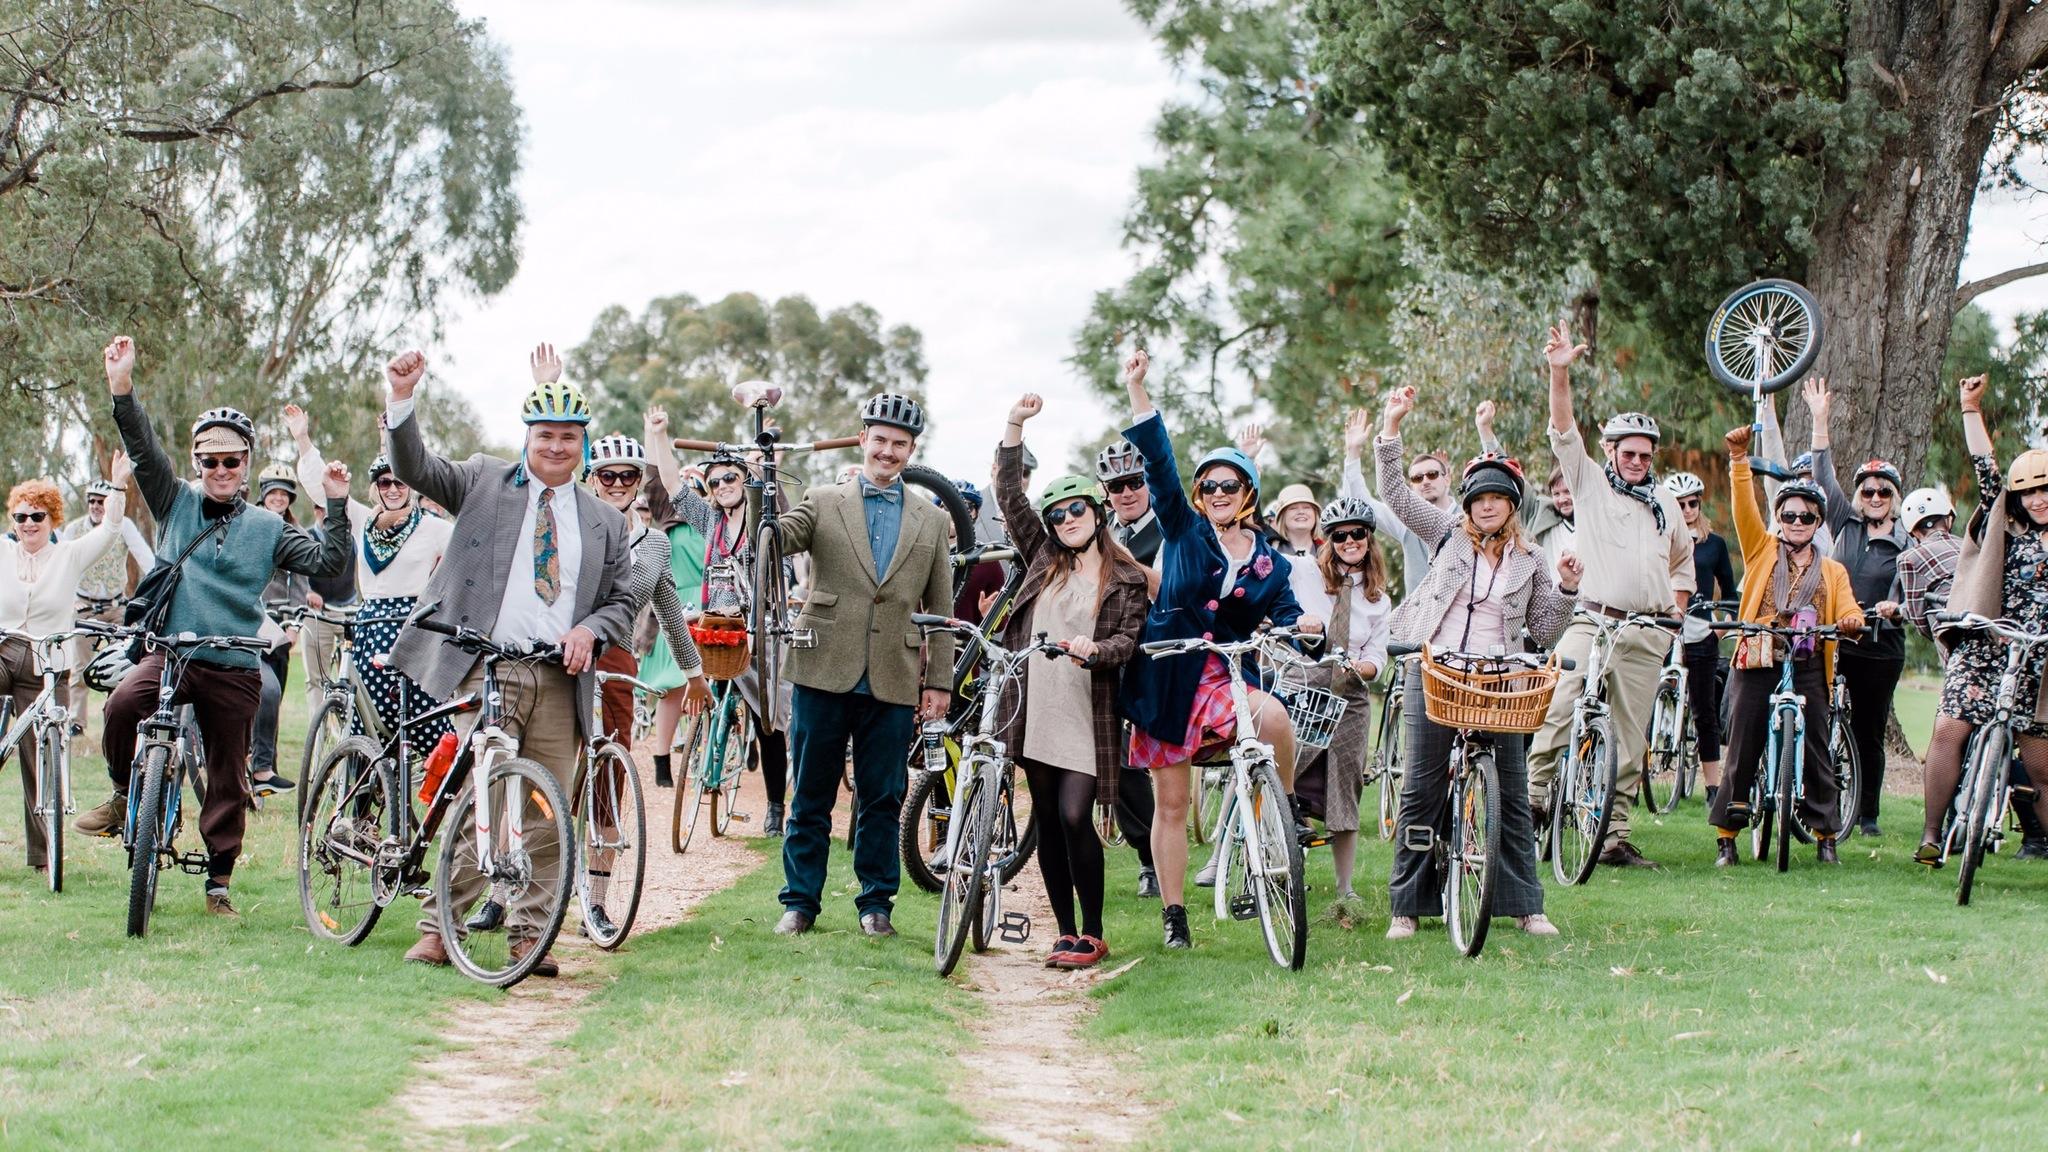 Group Photo at last year's Tweed Ride